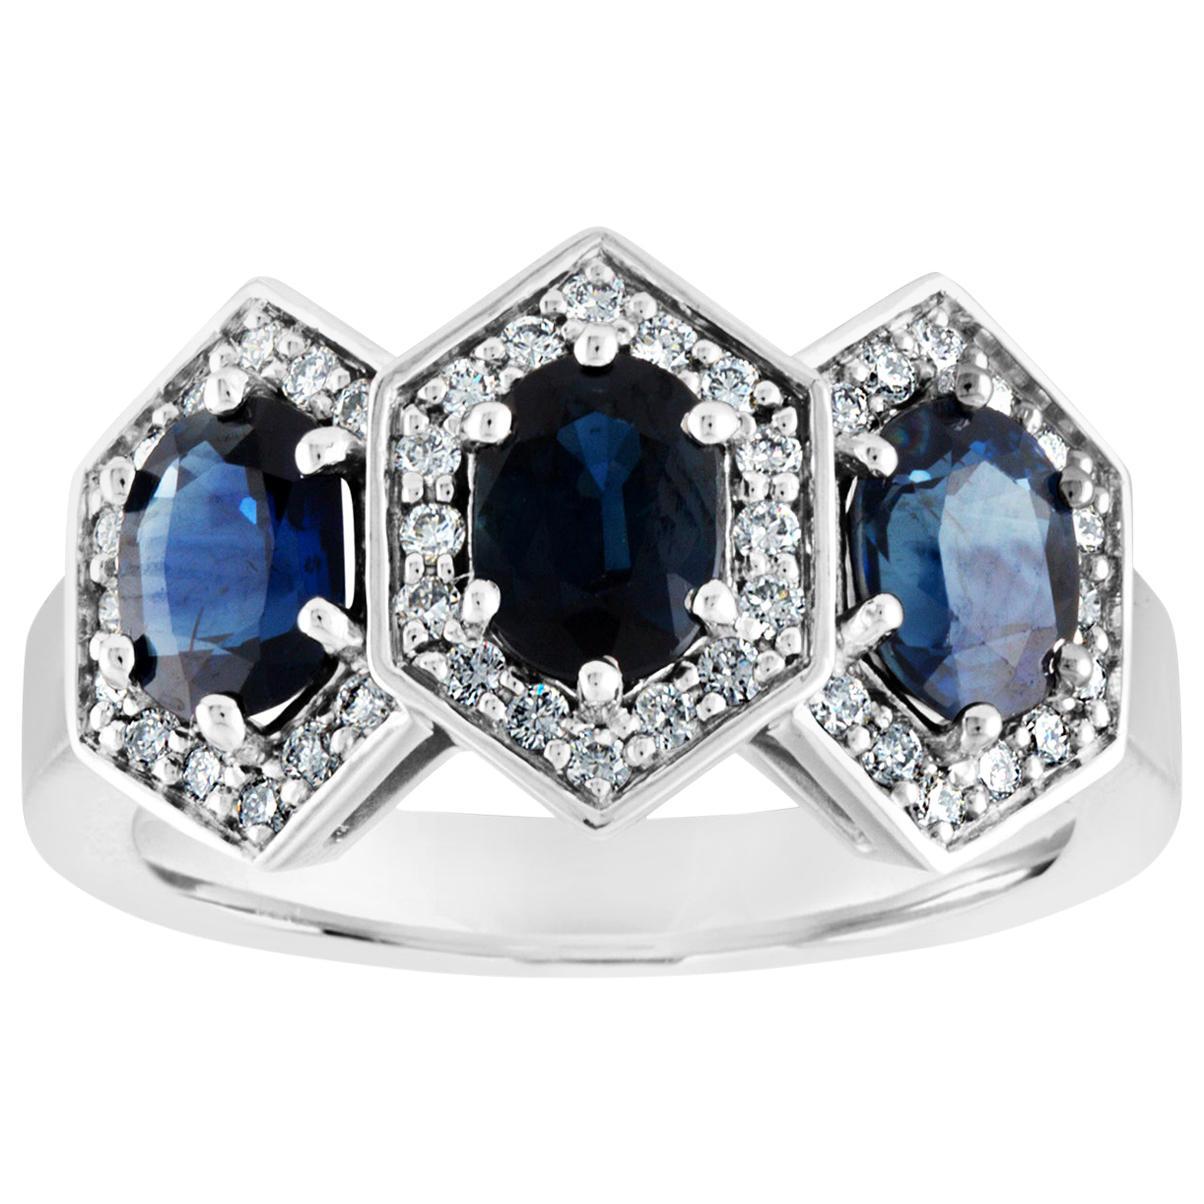 2.22 Carat Three-Stone Hexagon Blue Sapphire Diamond Gold Band Ring